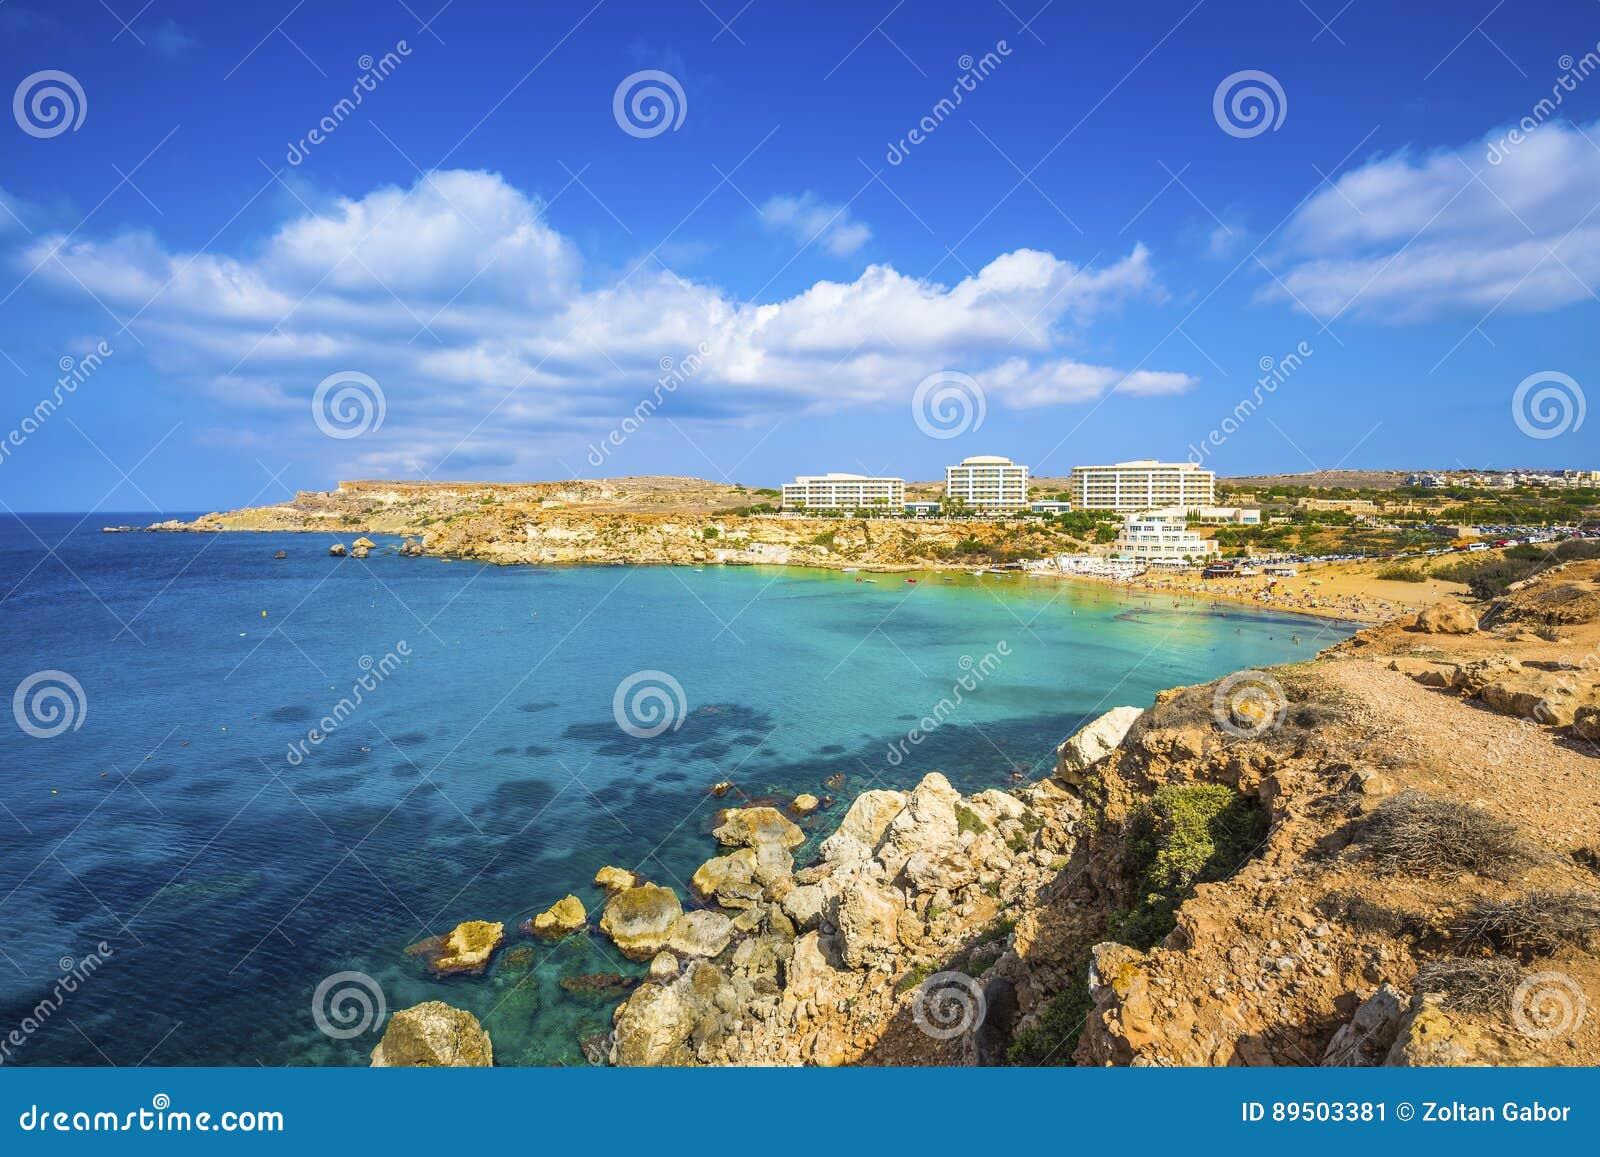 Ghajn Tuffieha, Μάλτα - πανοραμική άποψη οριζόντων του χρυσού κόλπου, ομορφότερη αμμώδης παραλία της Μάλτας ` s